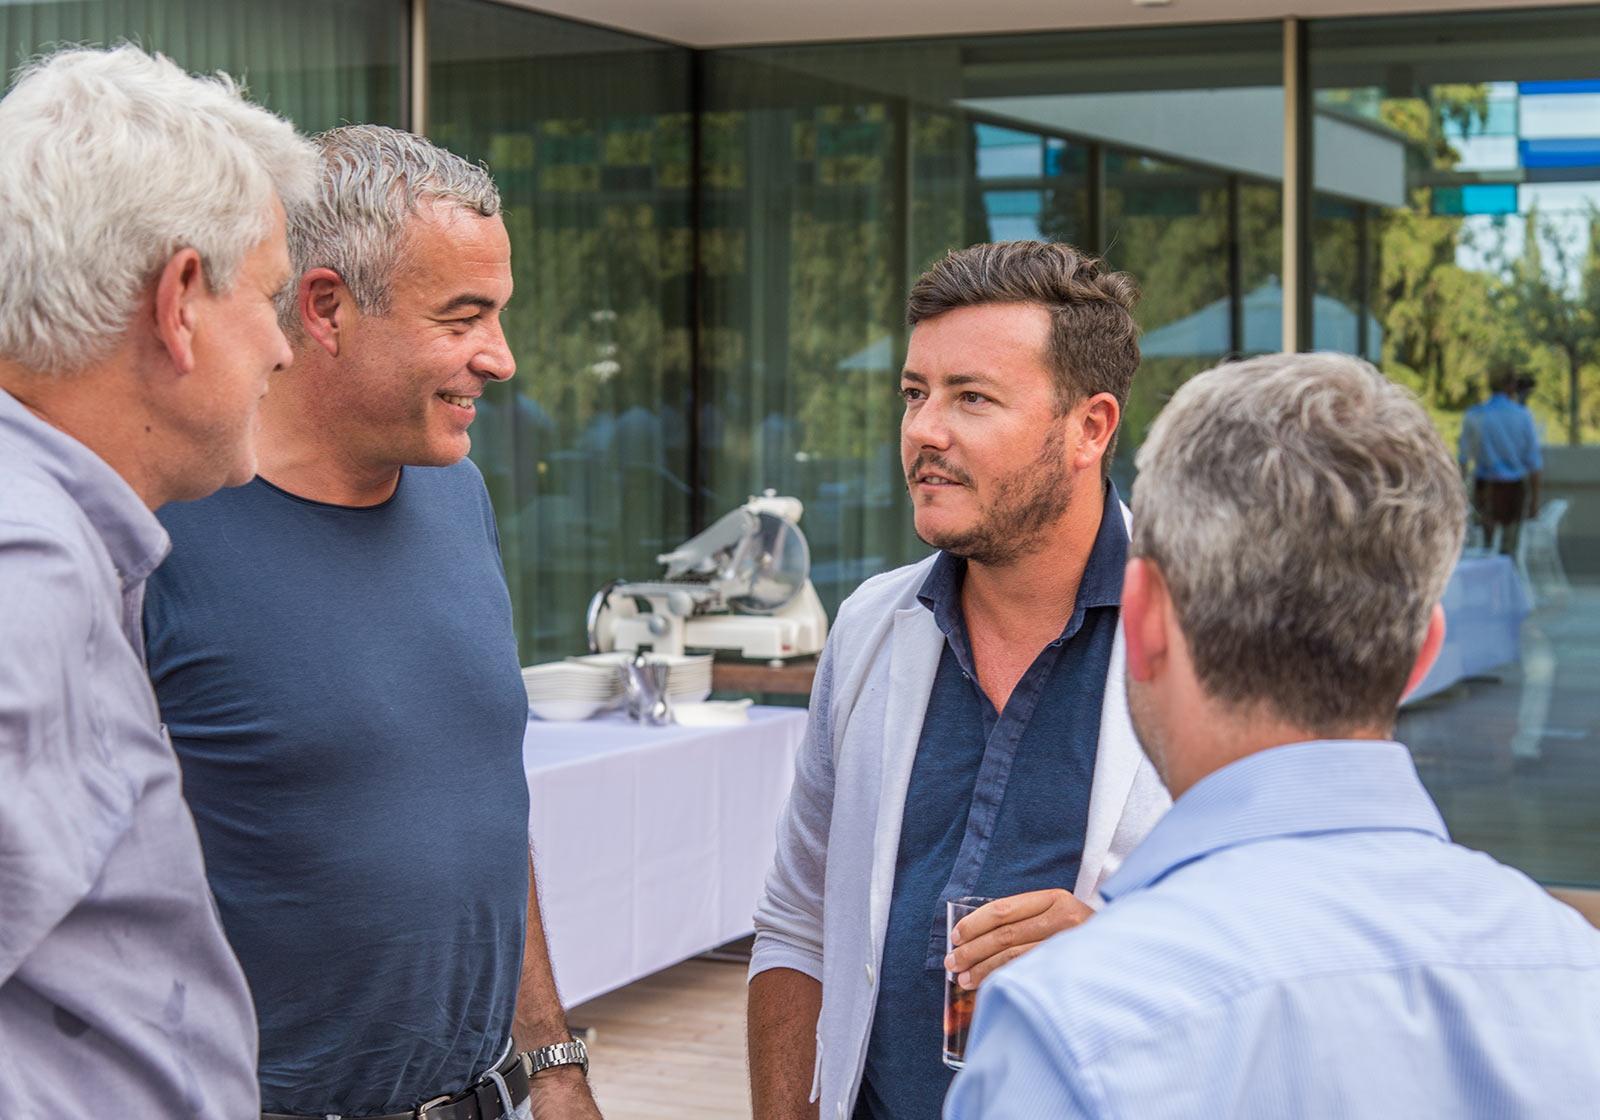 Marc Mark, ATP-Partner und GF ATP sphere (2.v.l.) mit Bauherr René Benko, Beiratsvorsitzender SIGNA Gruppe (2.v.r.). Foto: SIGNA/ av-media productions gmbH